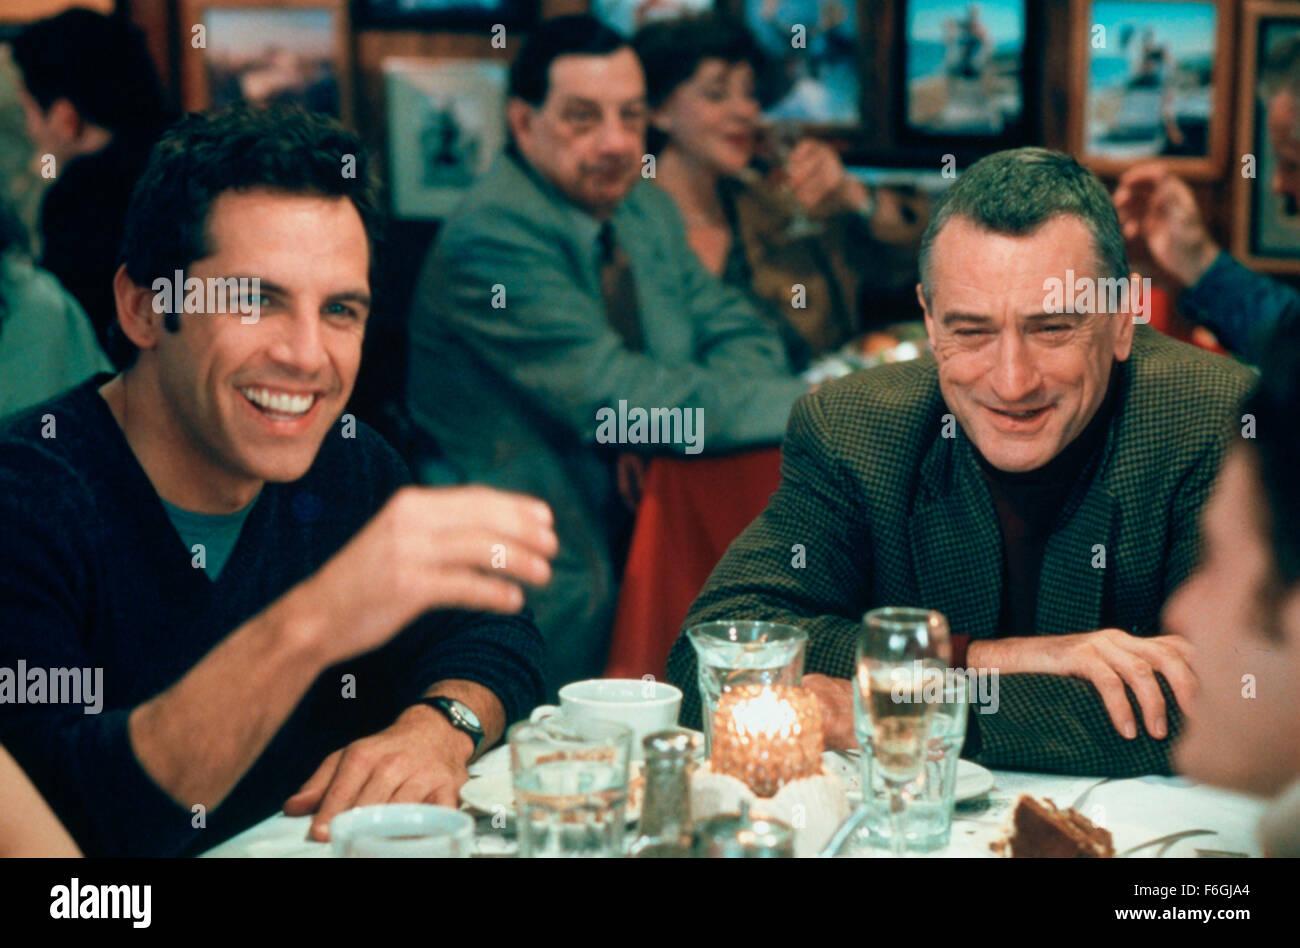 Mar 04, 2000; Hollywood, CA, USA; BEN STILLER and ROBERT DE NIRO star as Greg Focker and Jack Byrnes in the comedy - Stock Image